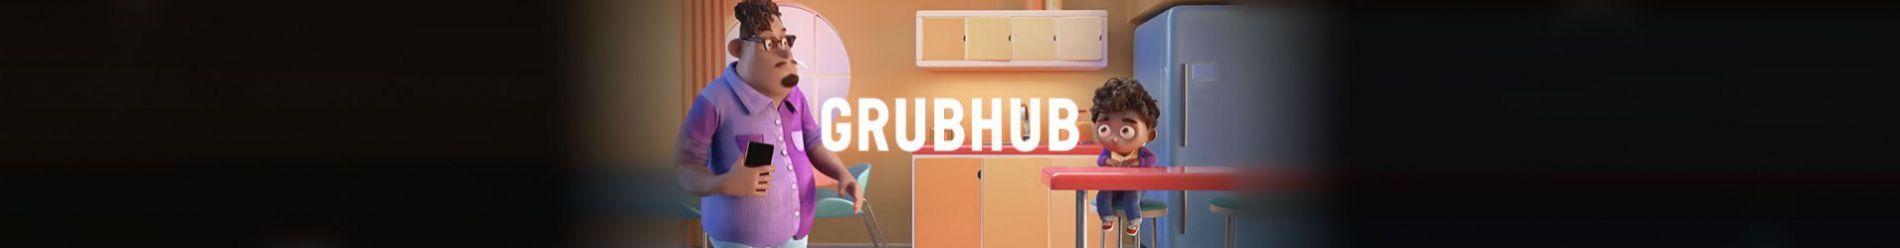 2 Phút Hơn (KAIZ Remix) by Pháo is used in Grubhub US TV spot!